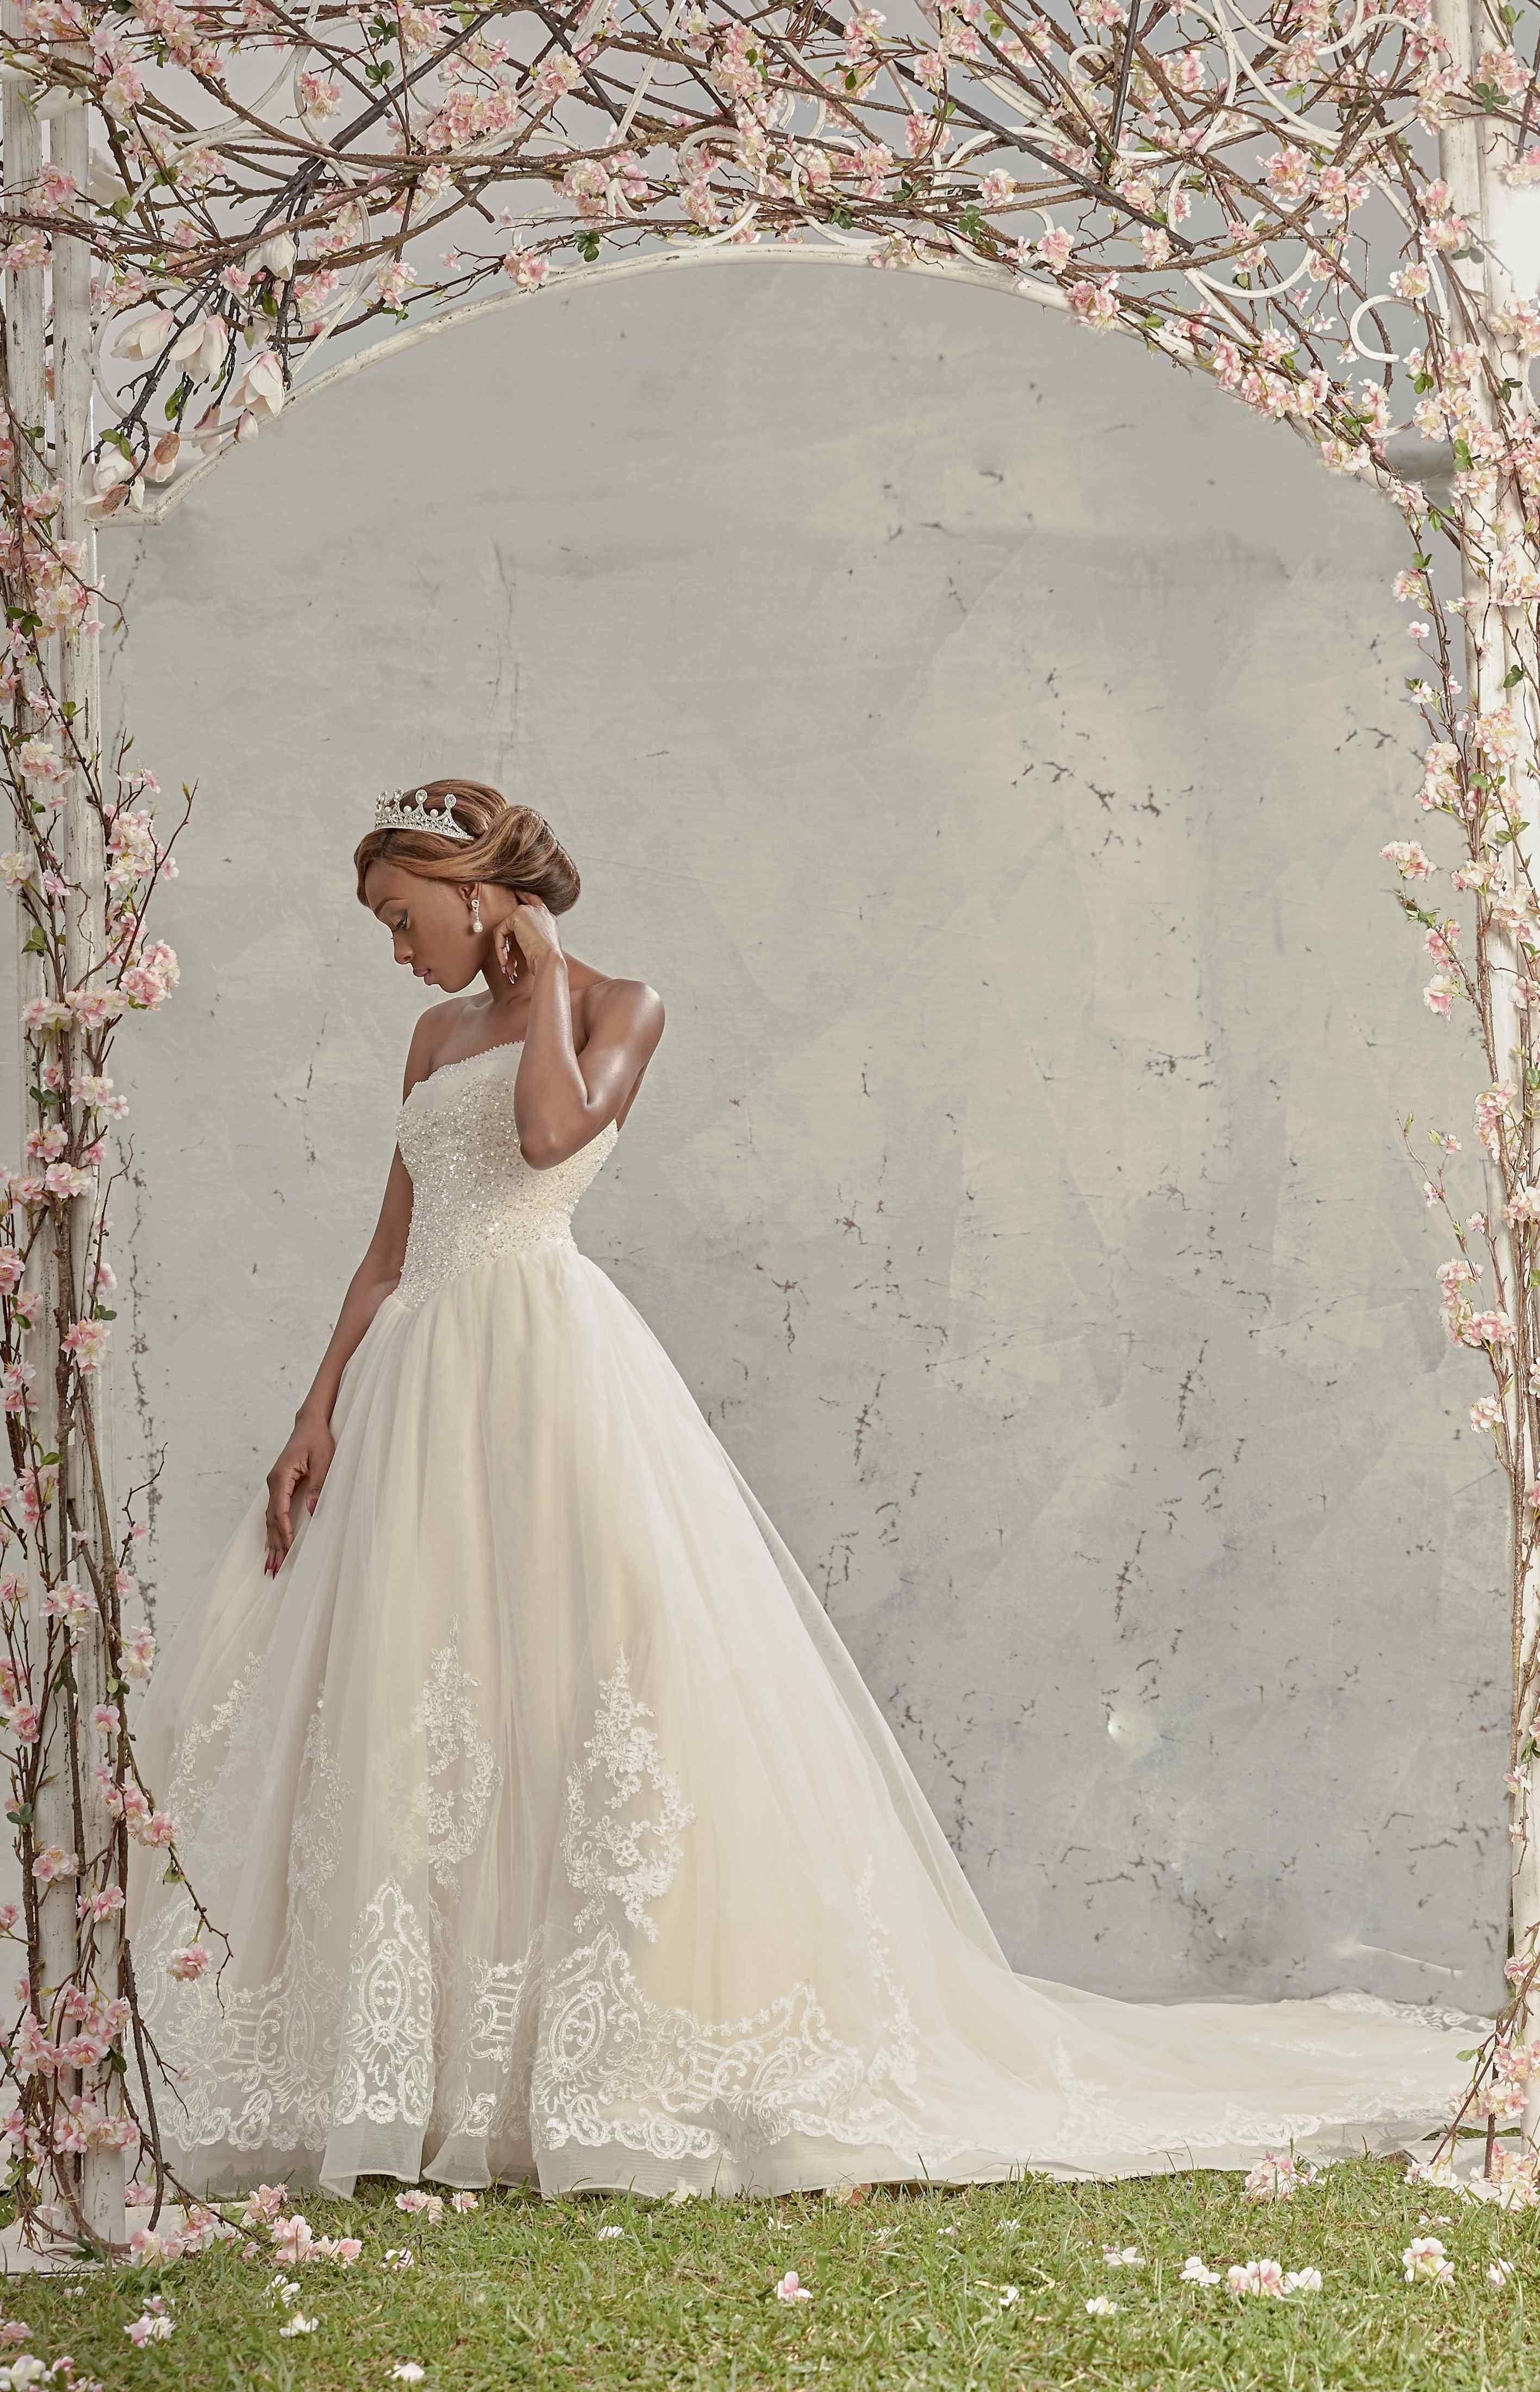 Wedding dresses stores  dkqb  Stylish Wedding Dresses  Pinterest  Bridal stores